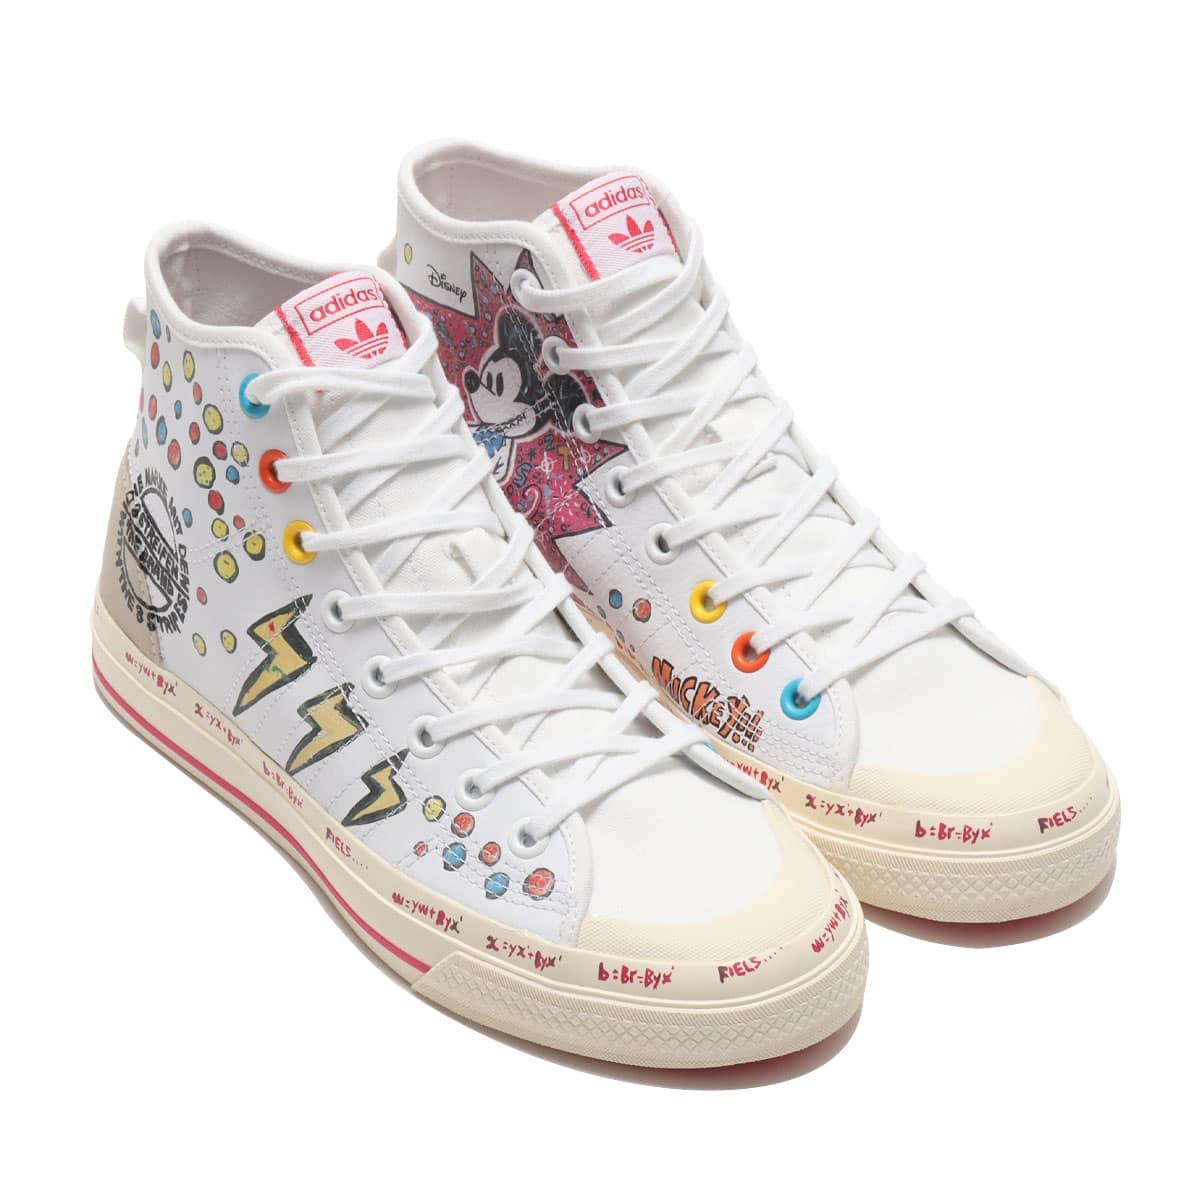 "adidas NIZZA HI RF ""Kasing Lung x Mickey Mouse x adidas Mickey Twist"" FOOTWEAR WHITE/FOOTWEAR WHITE/WONDER GLOW 20FW-S_photo_large"